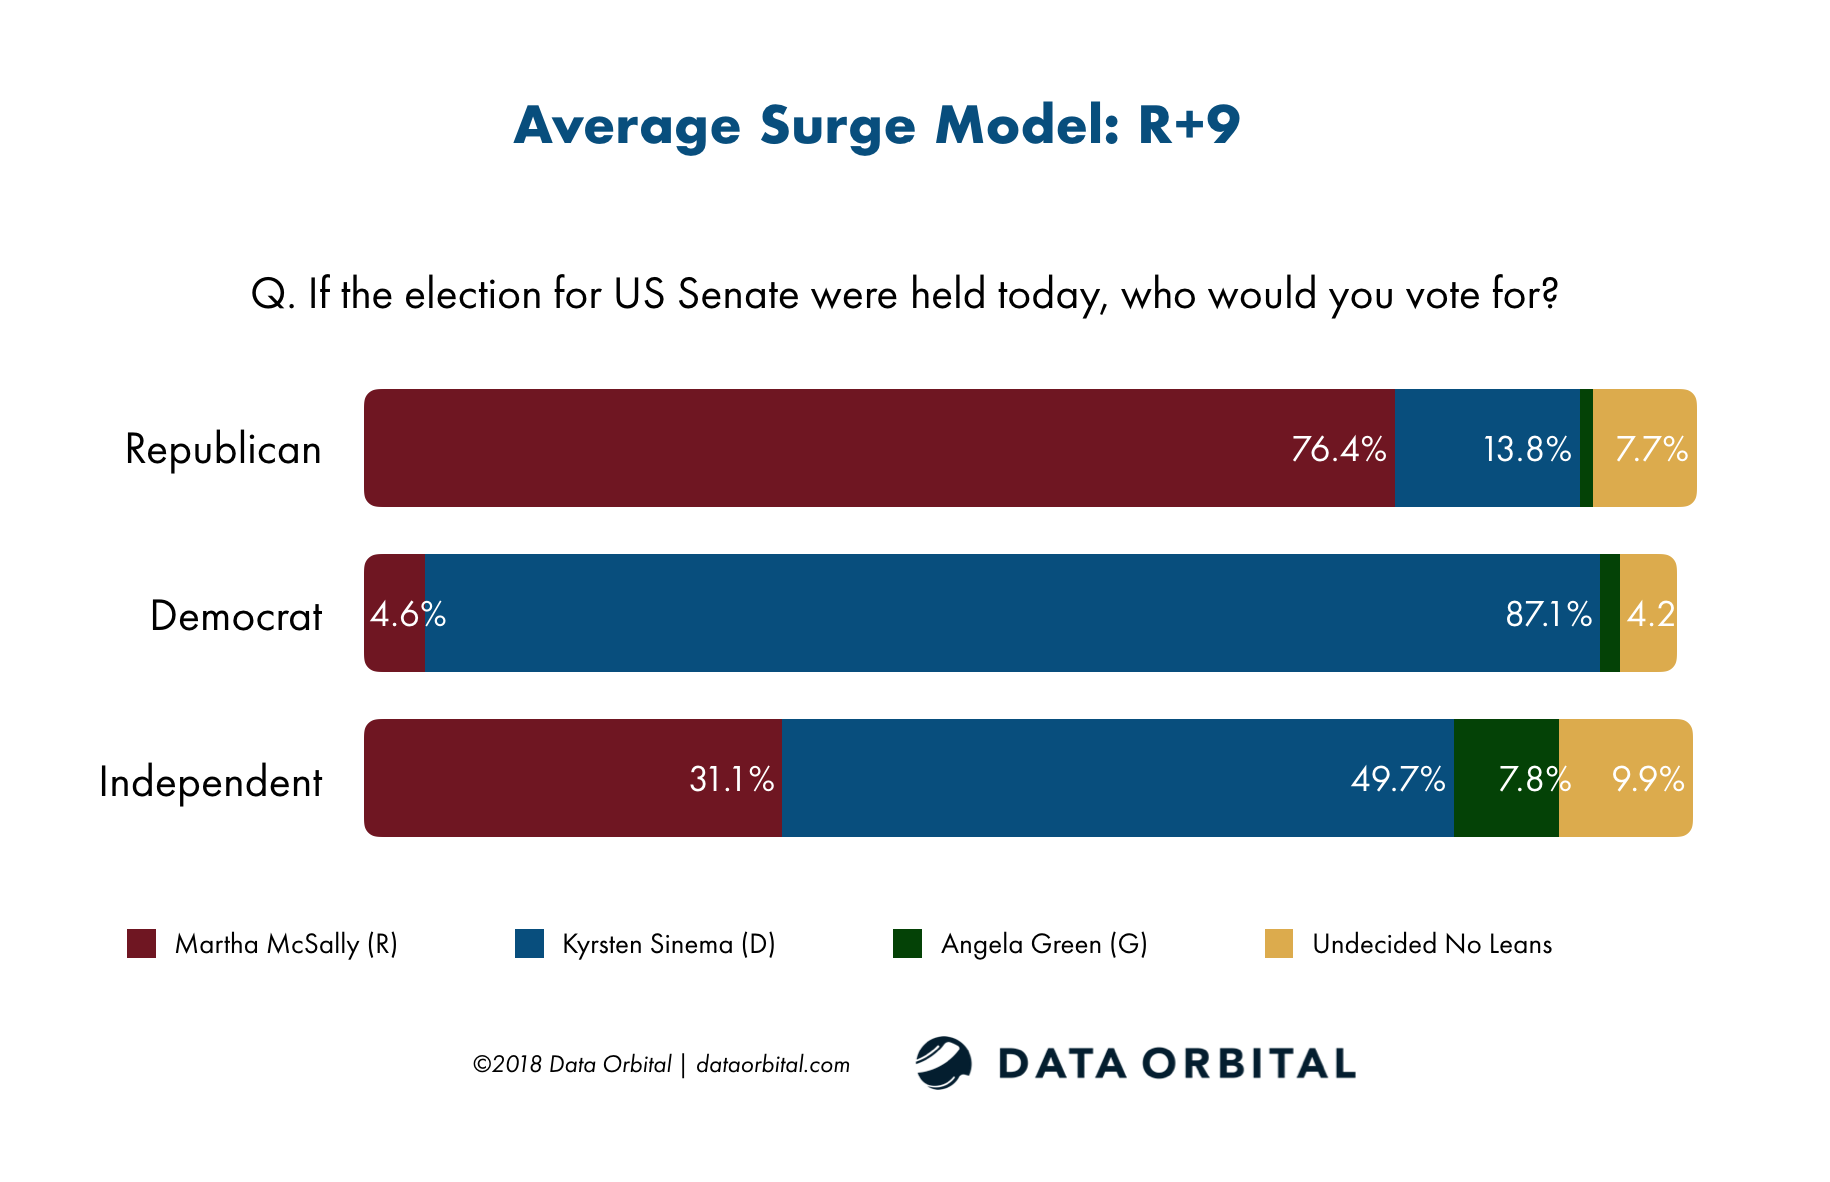 Data Orbital Average Surge Model US Senate by Party Survey October 2018